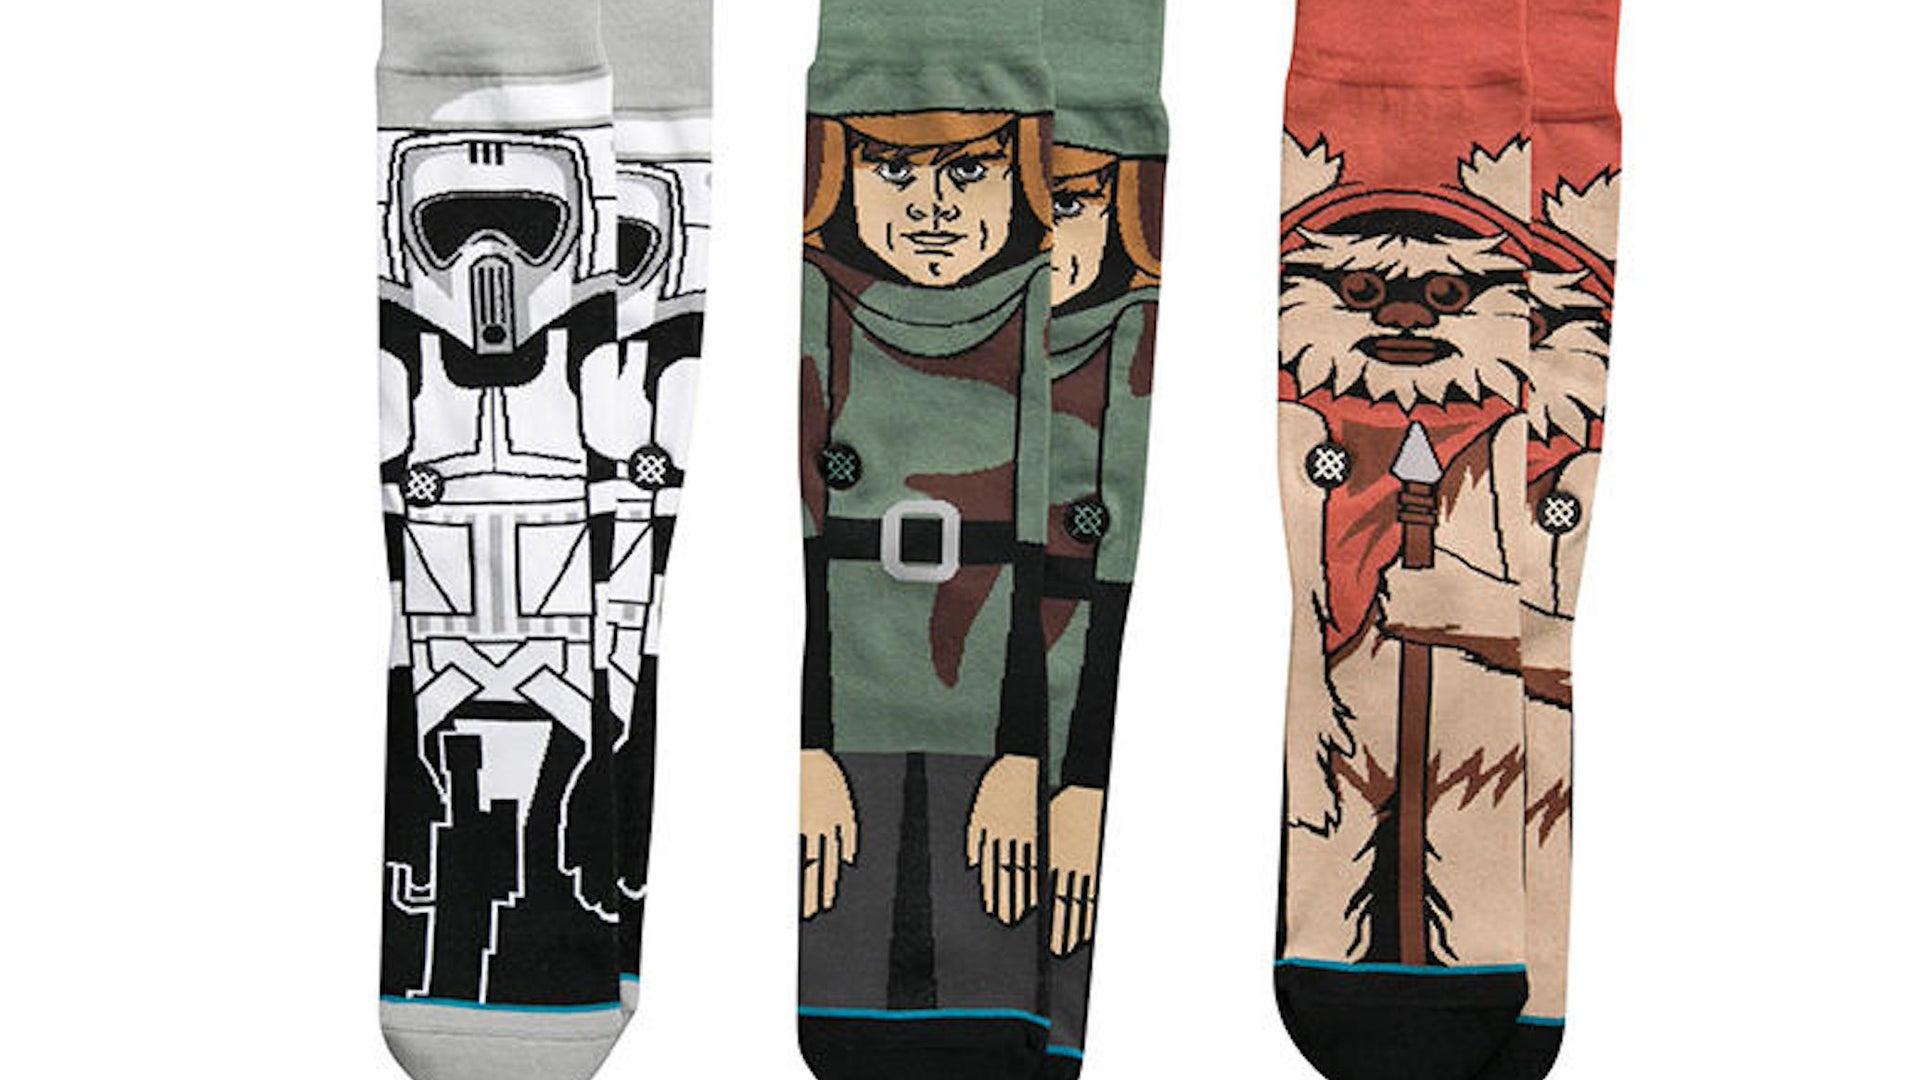 Return of the Jedi socks